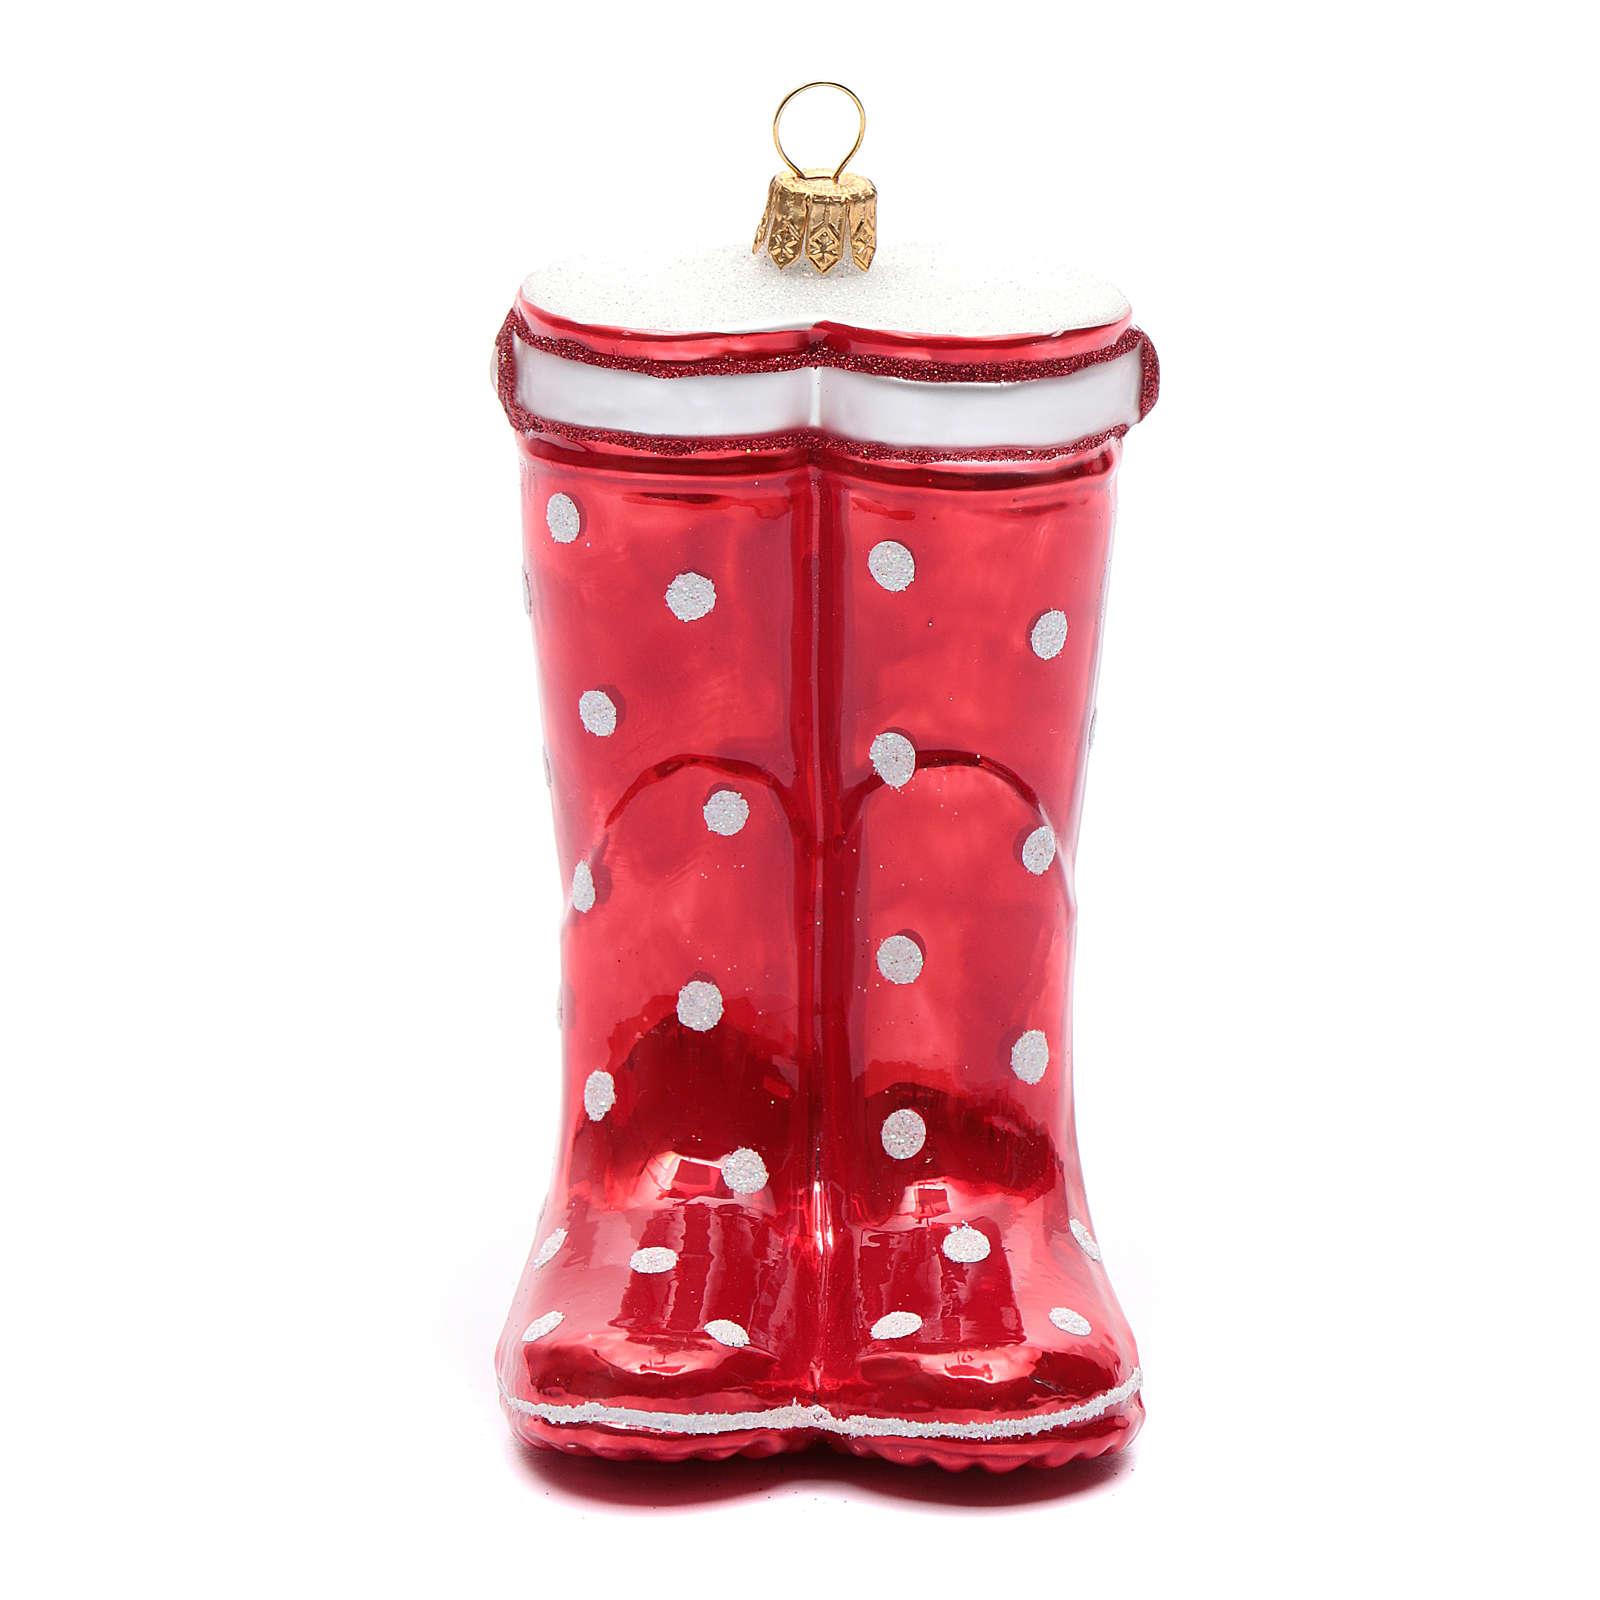 Bota roja adorno vidrio soplado Árbol de Navidad 4